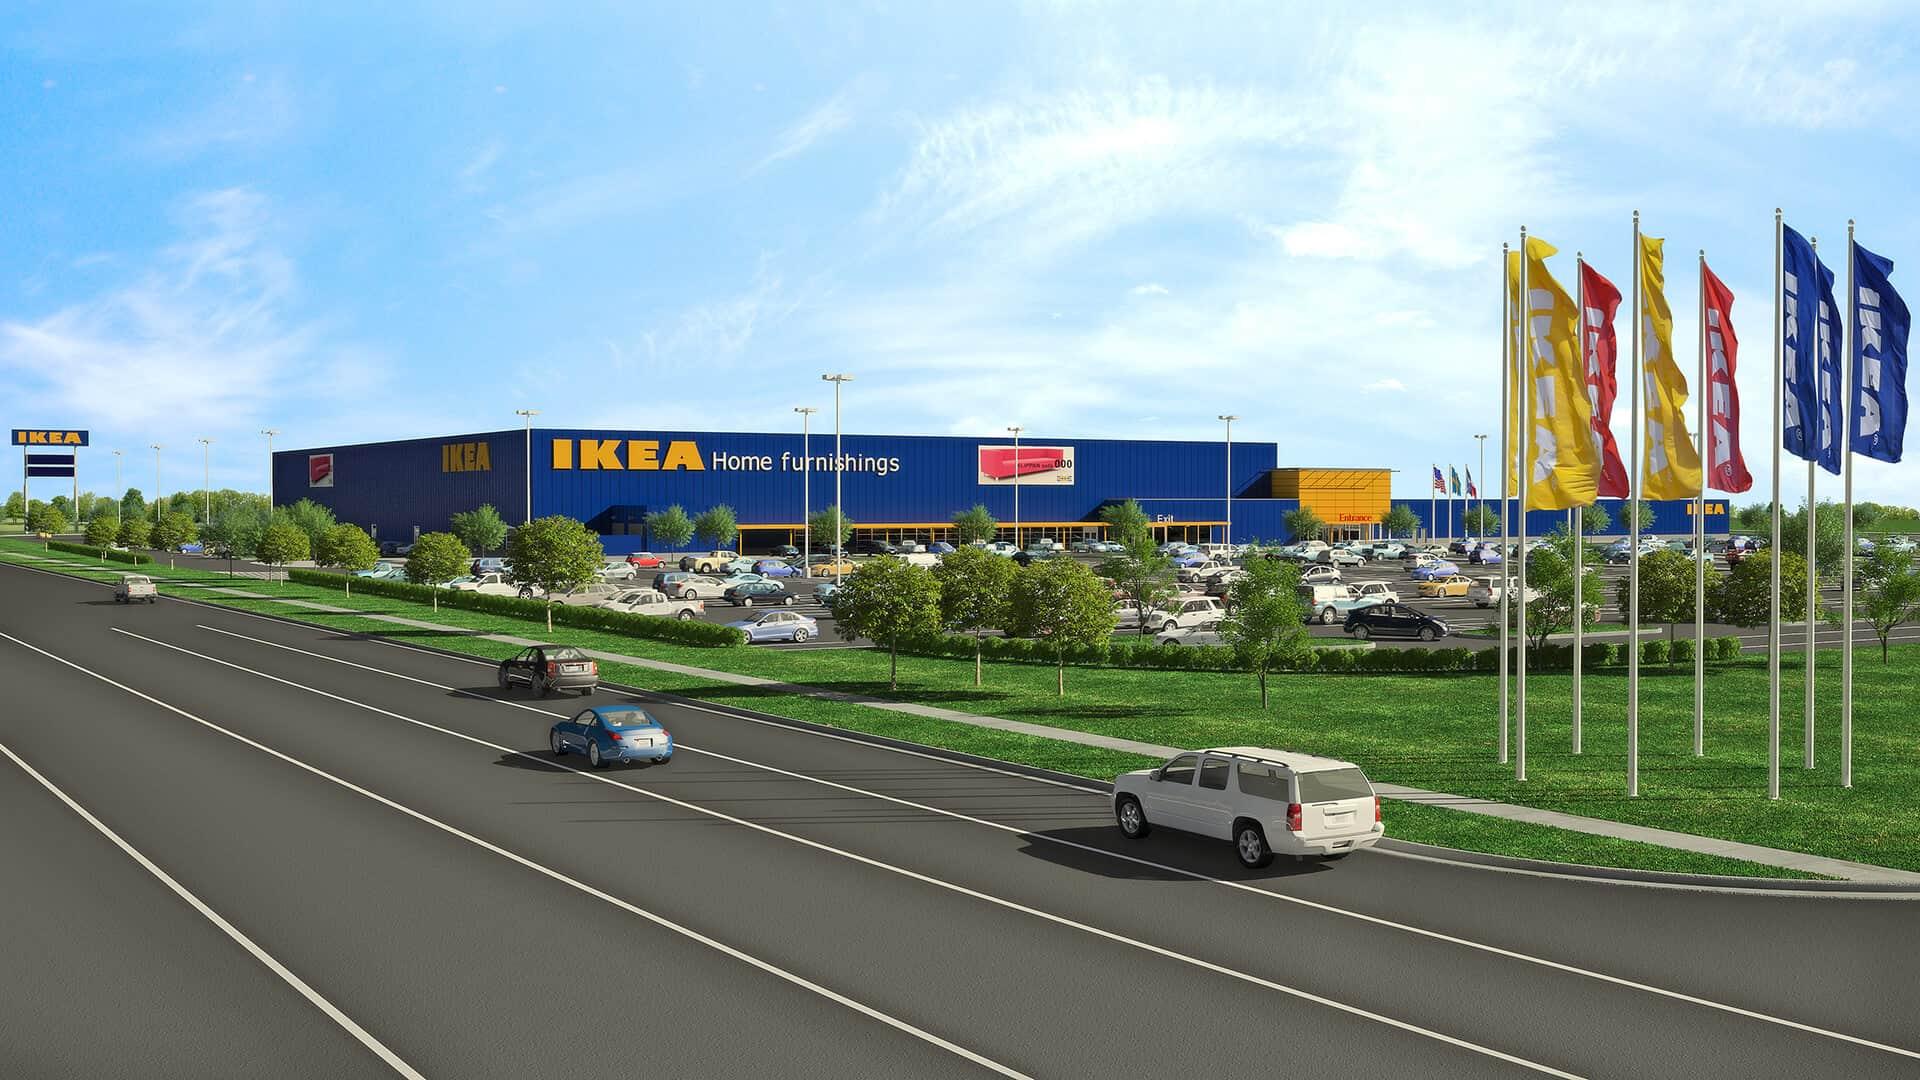 IKEA IKEA To Install 1.25 MW Solar Array Atop Future Grand Prairie Store